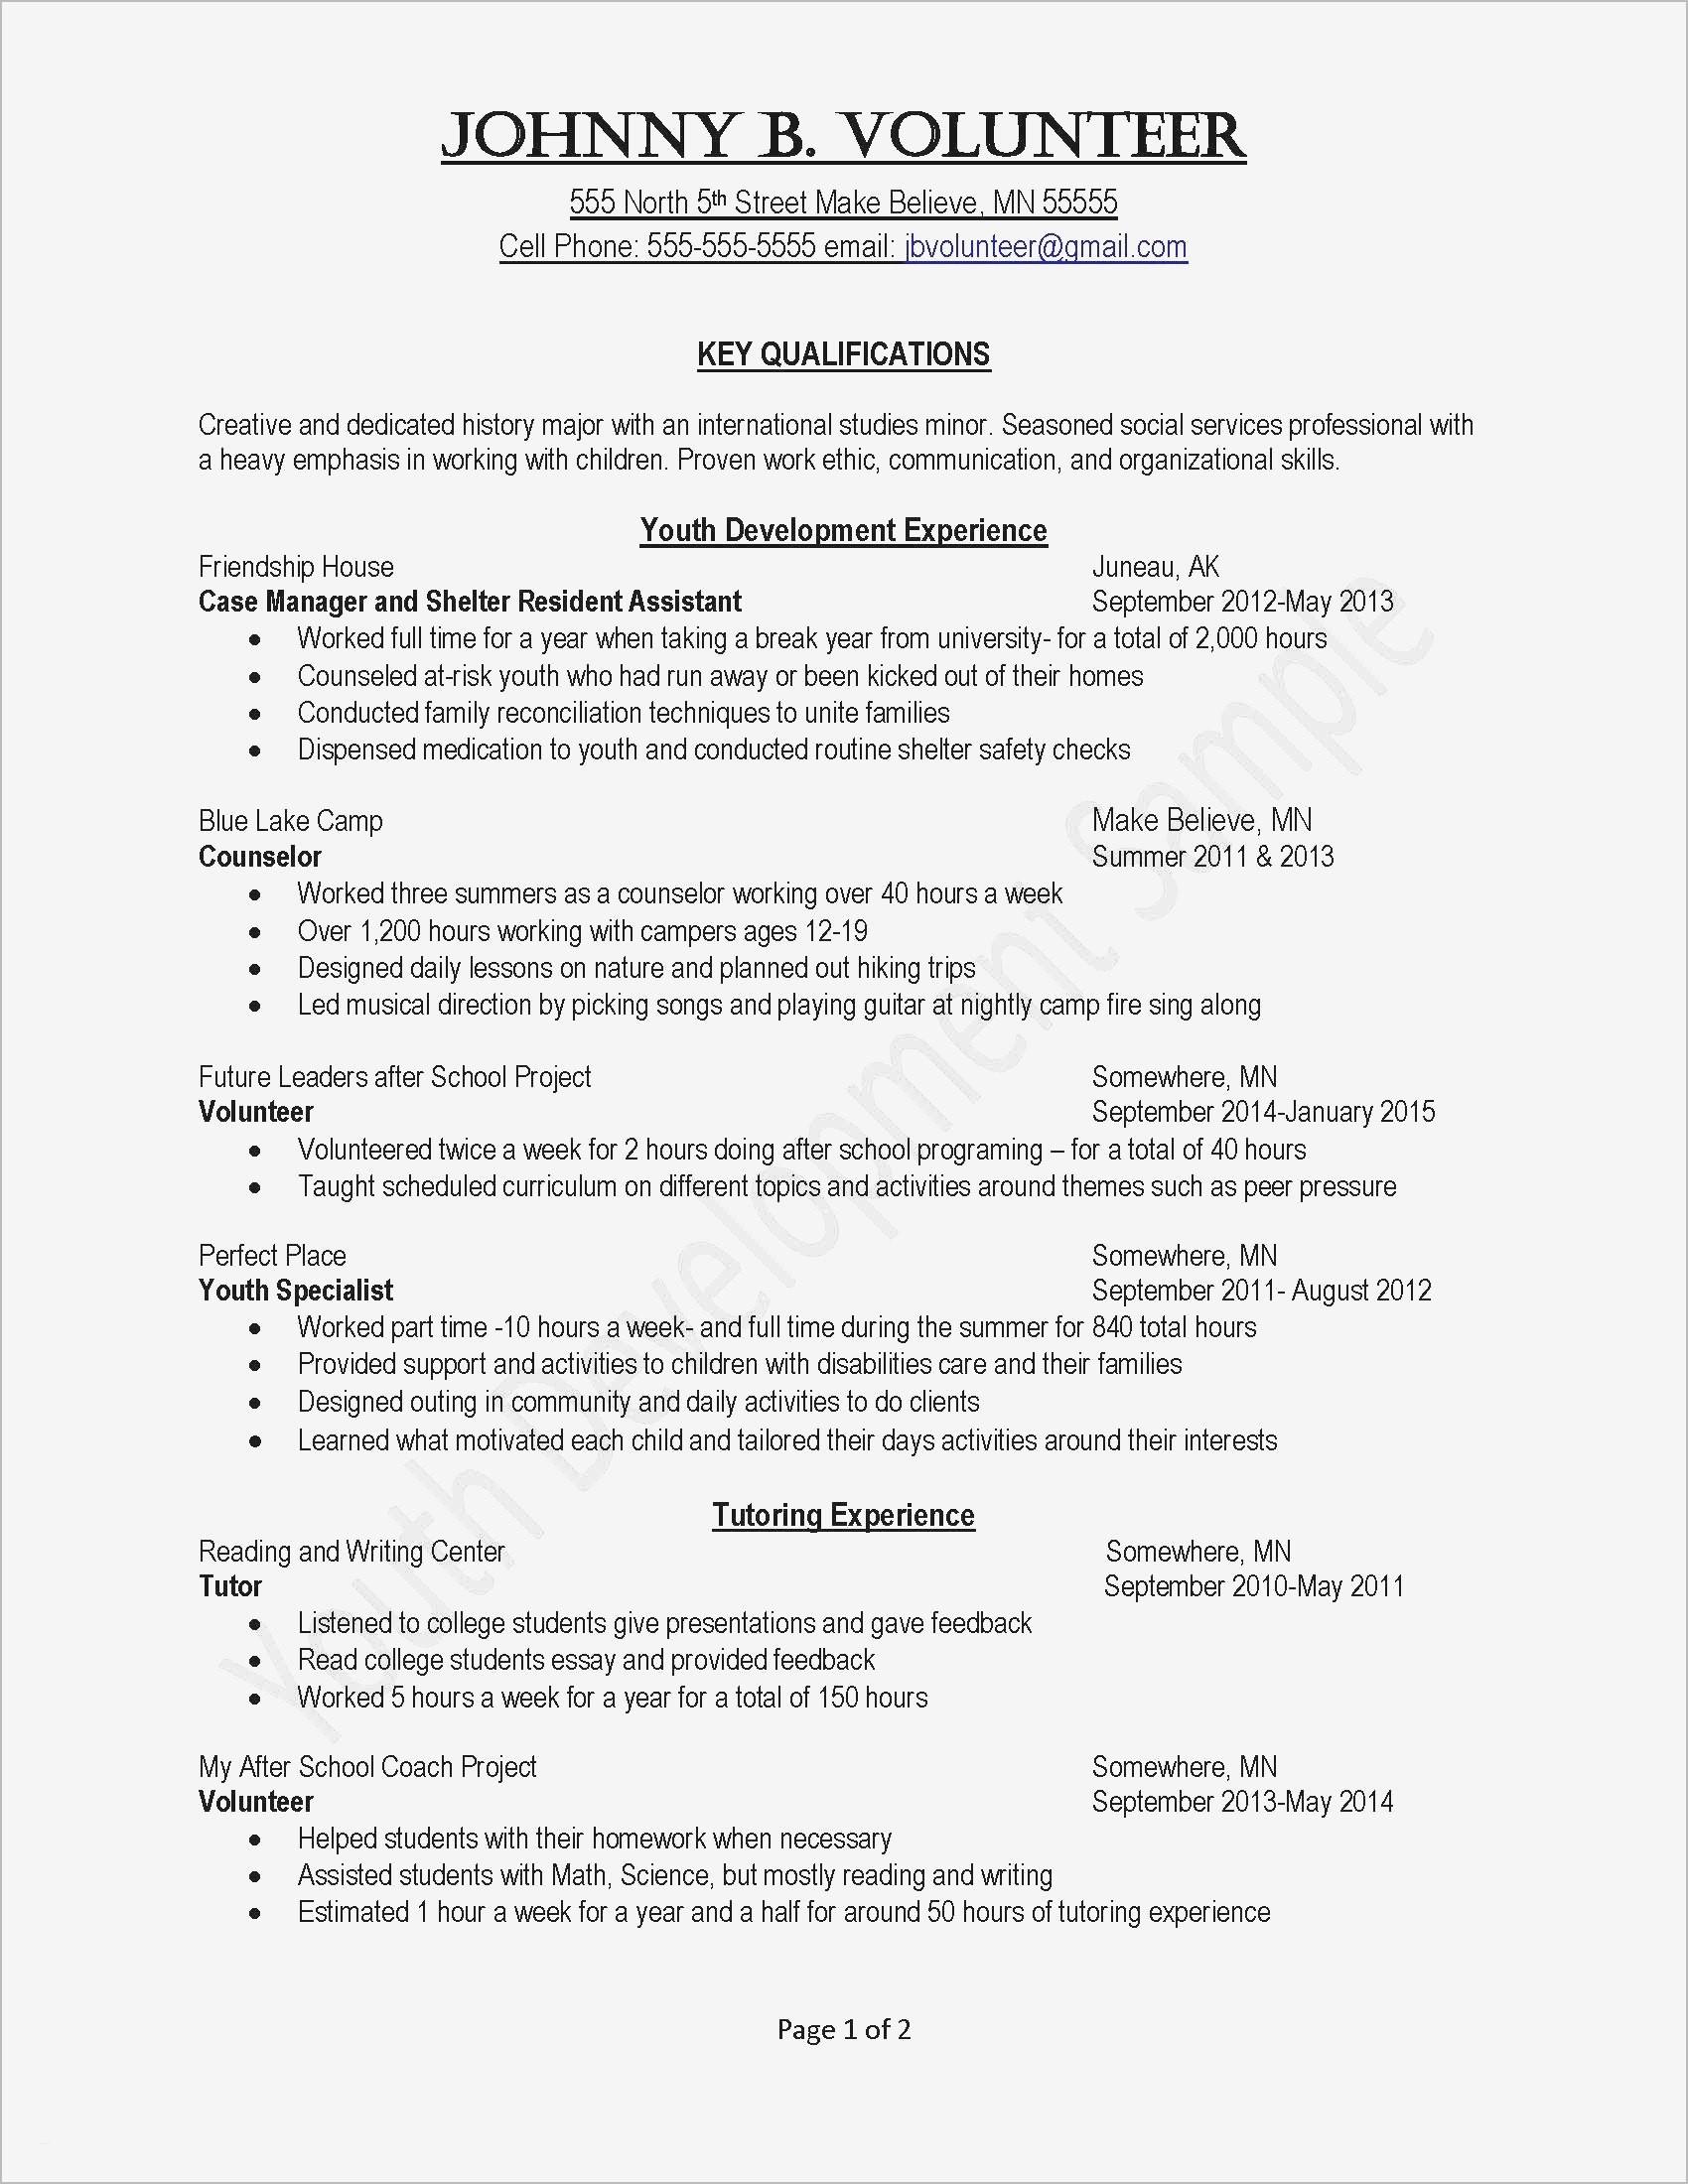 Free Cover Letter Template for Job Application - Job Fer Letter Template Us Copy Od Consultant Cover Letter Fungram